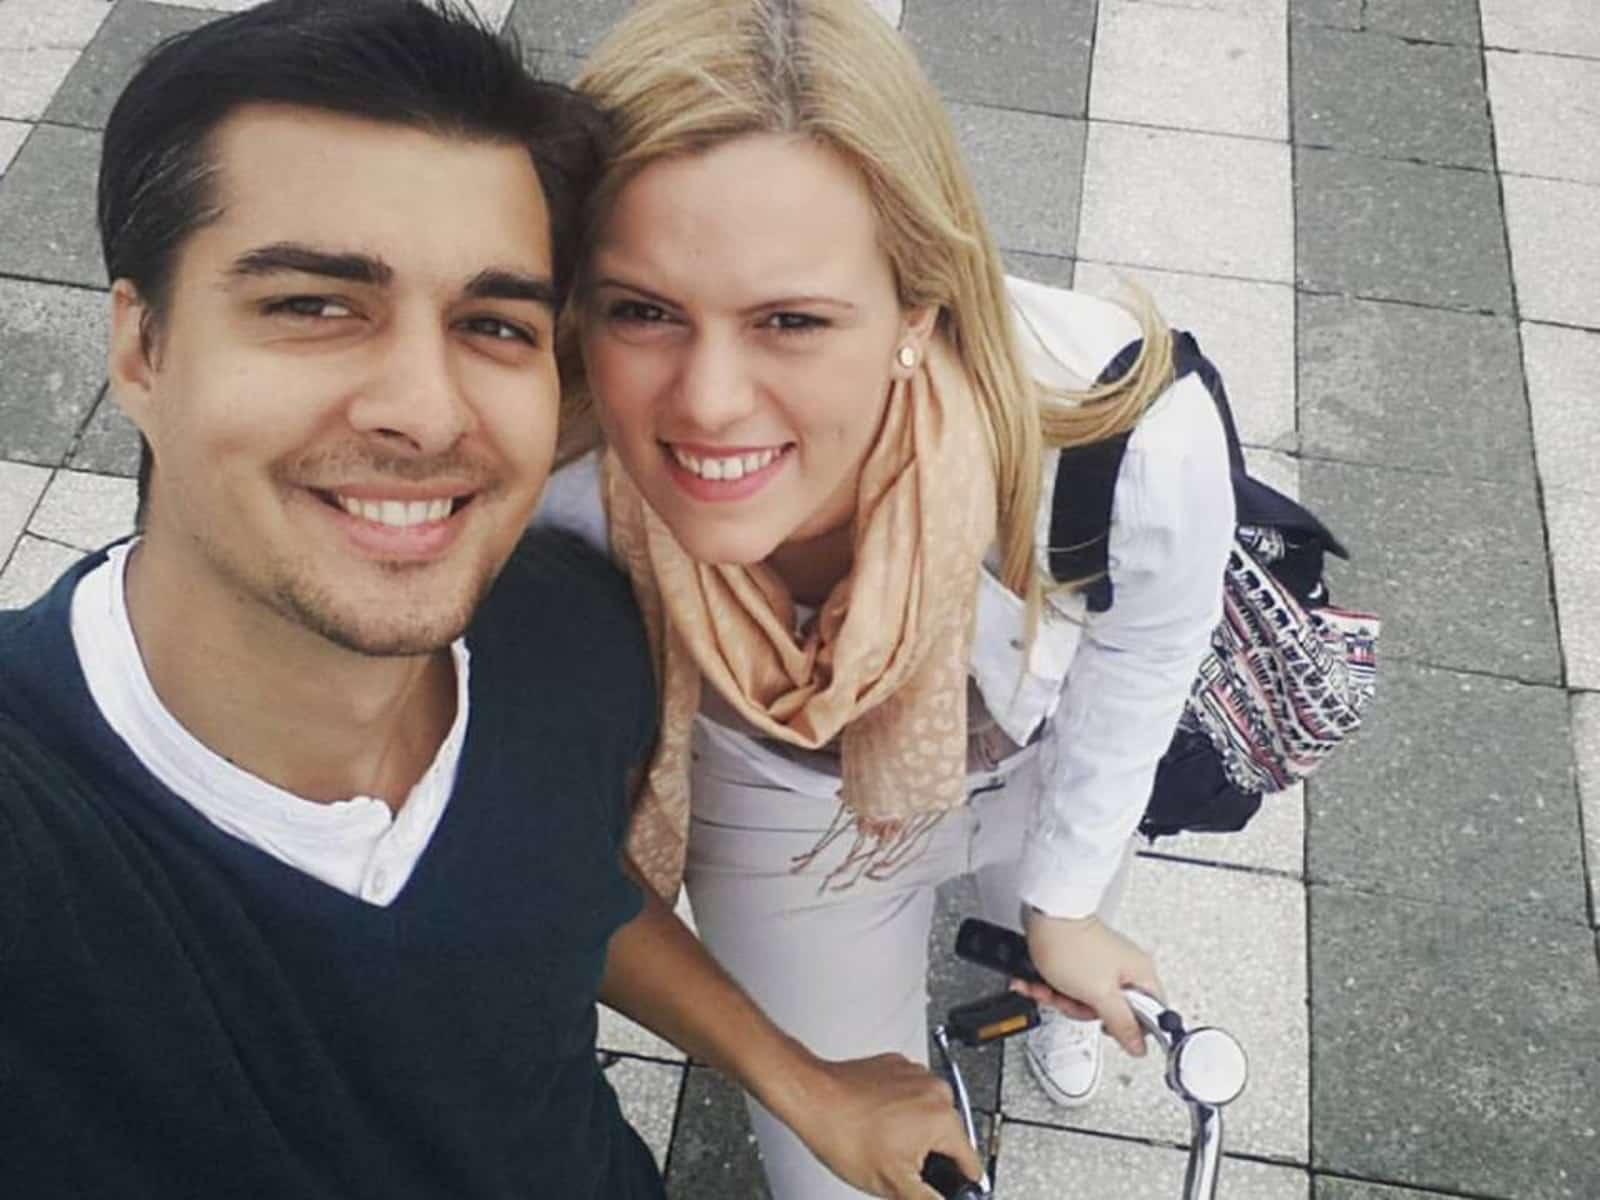 Pedja & Svetlana from Subotica, Serbia